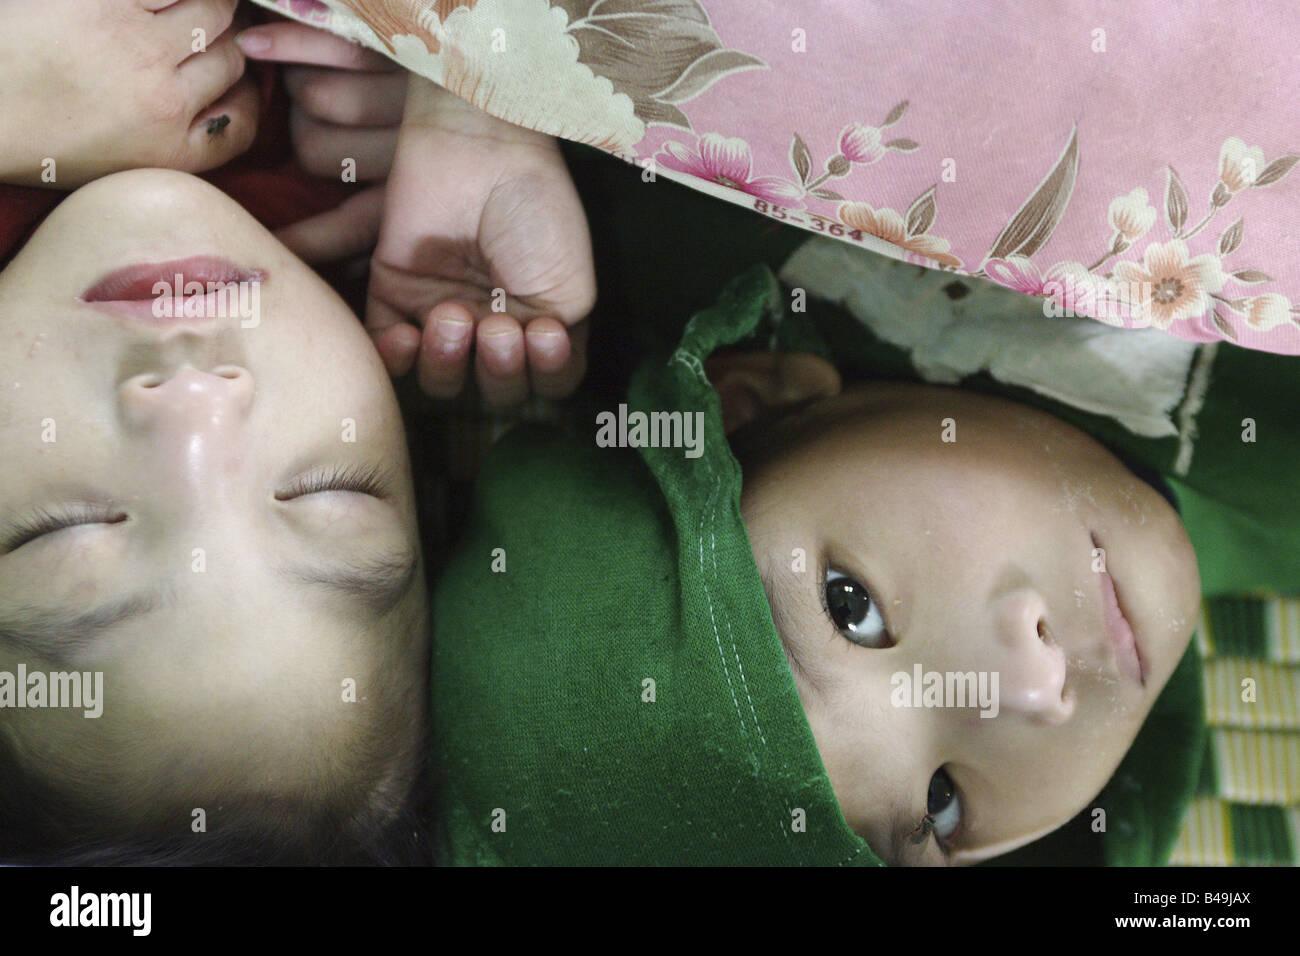 Centre for mentally disabled children, Van Thang, Vietnam Stock Photo